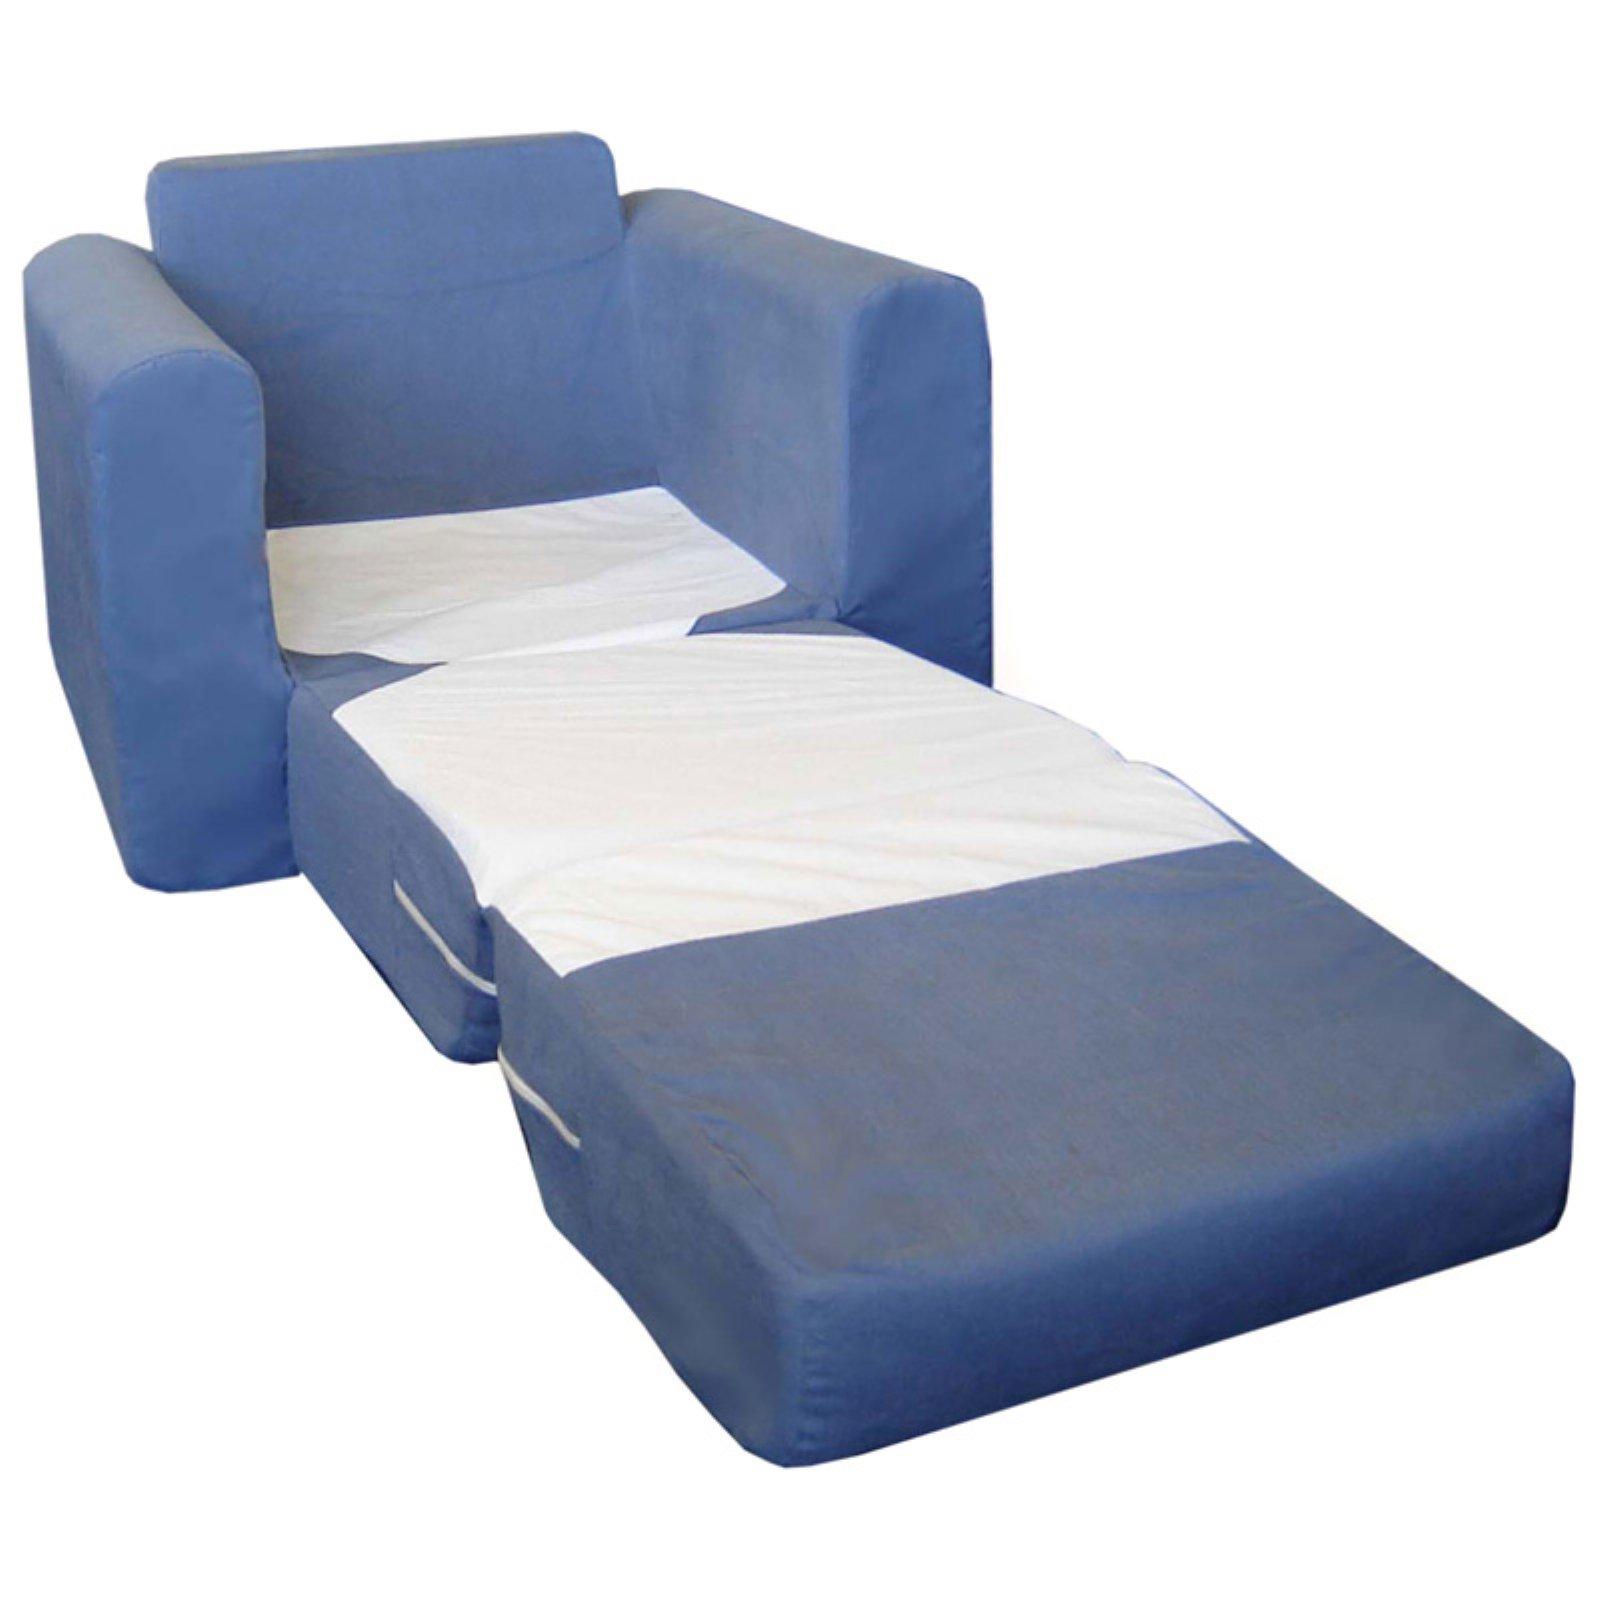 Chair Sleeper, Blue Micro Suede by Fun Furnishings